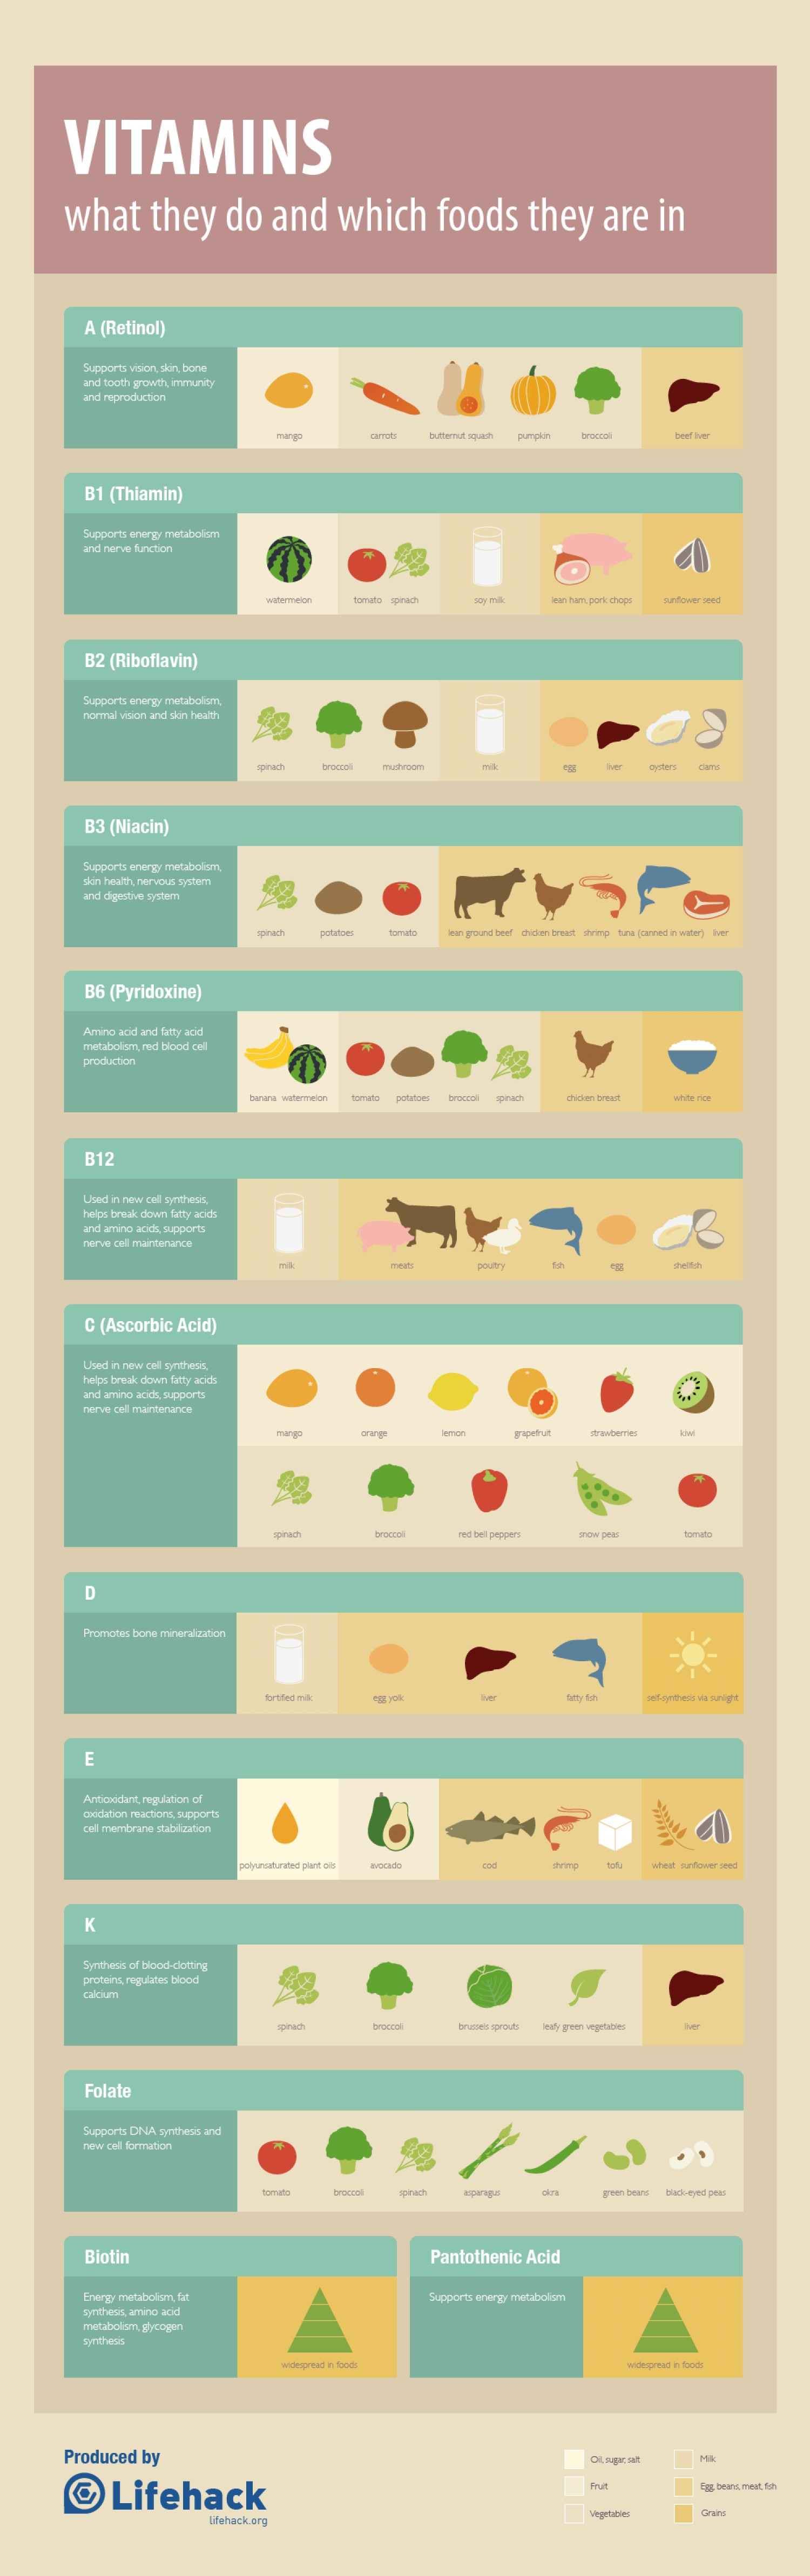 Vitamins-Cheat-Sheet.jpg